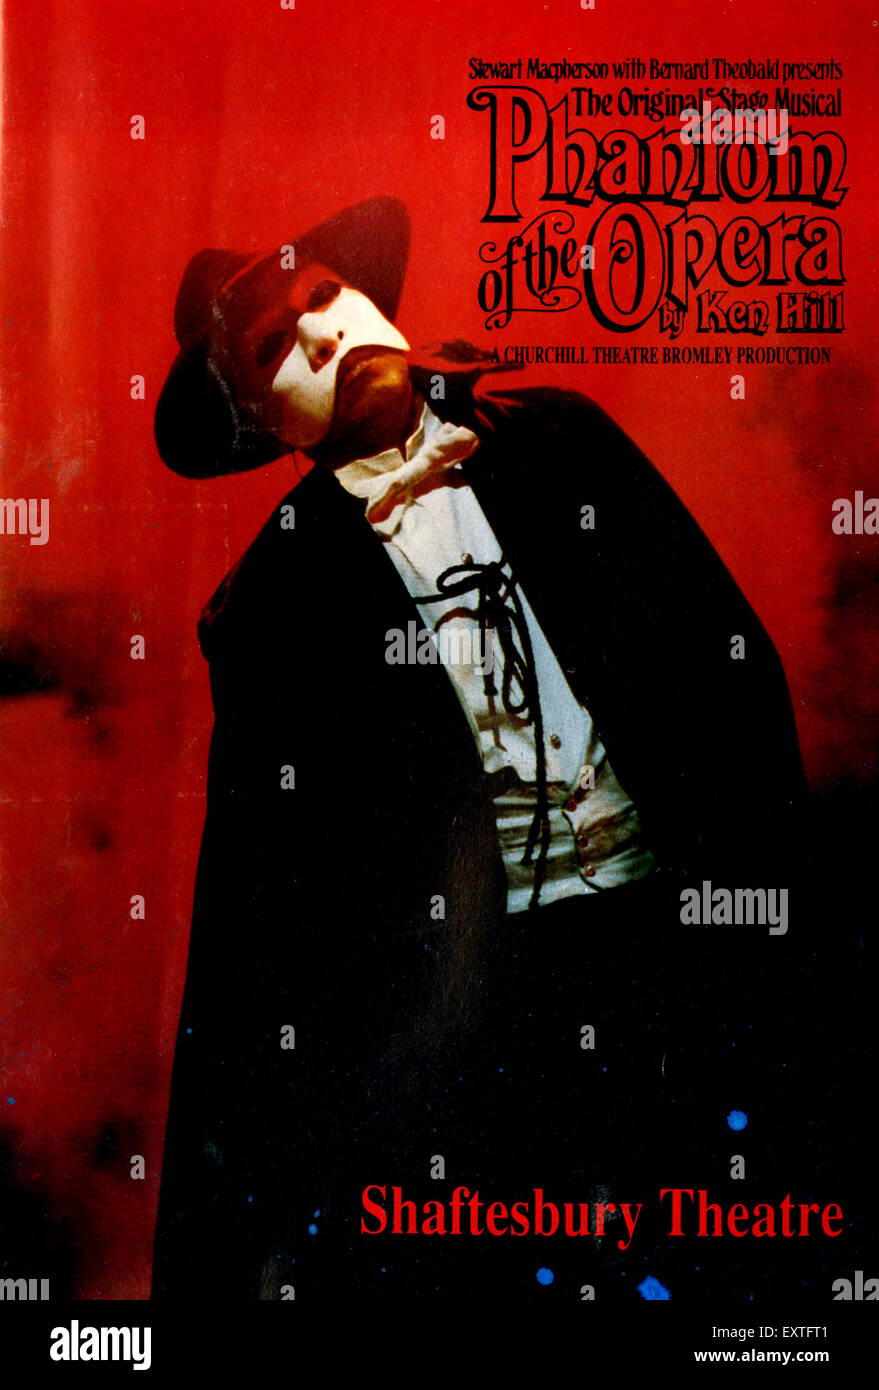 1990s UK Phantom of The Opera Poster - Stock Image